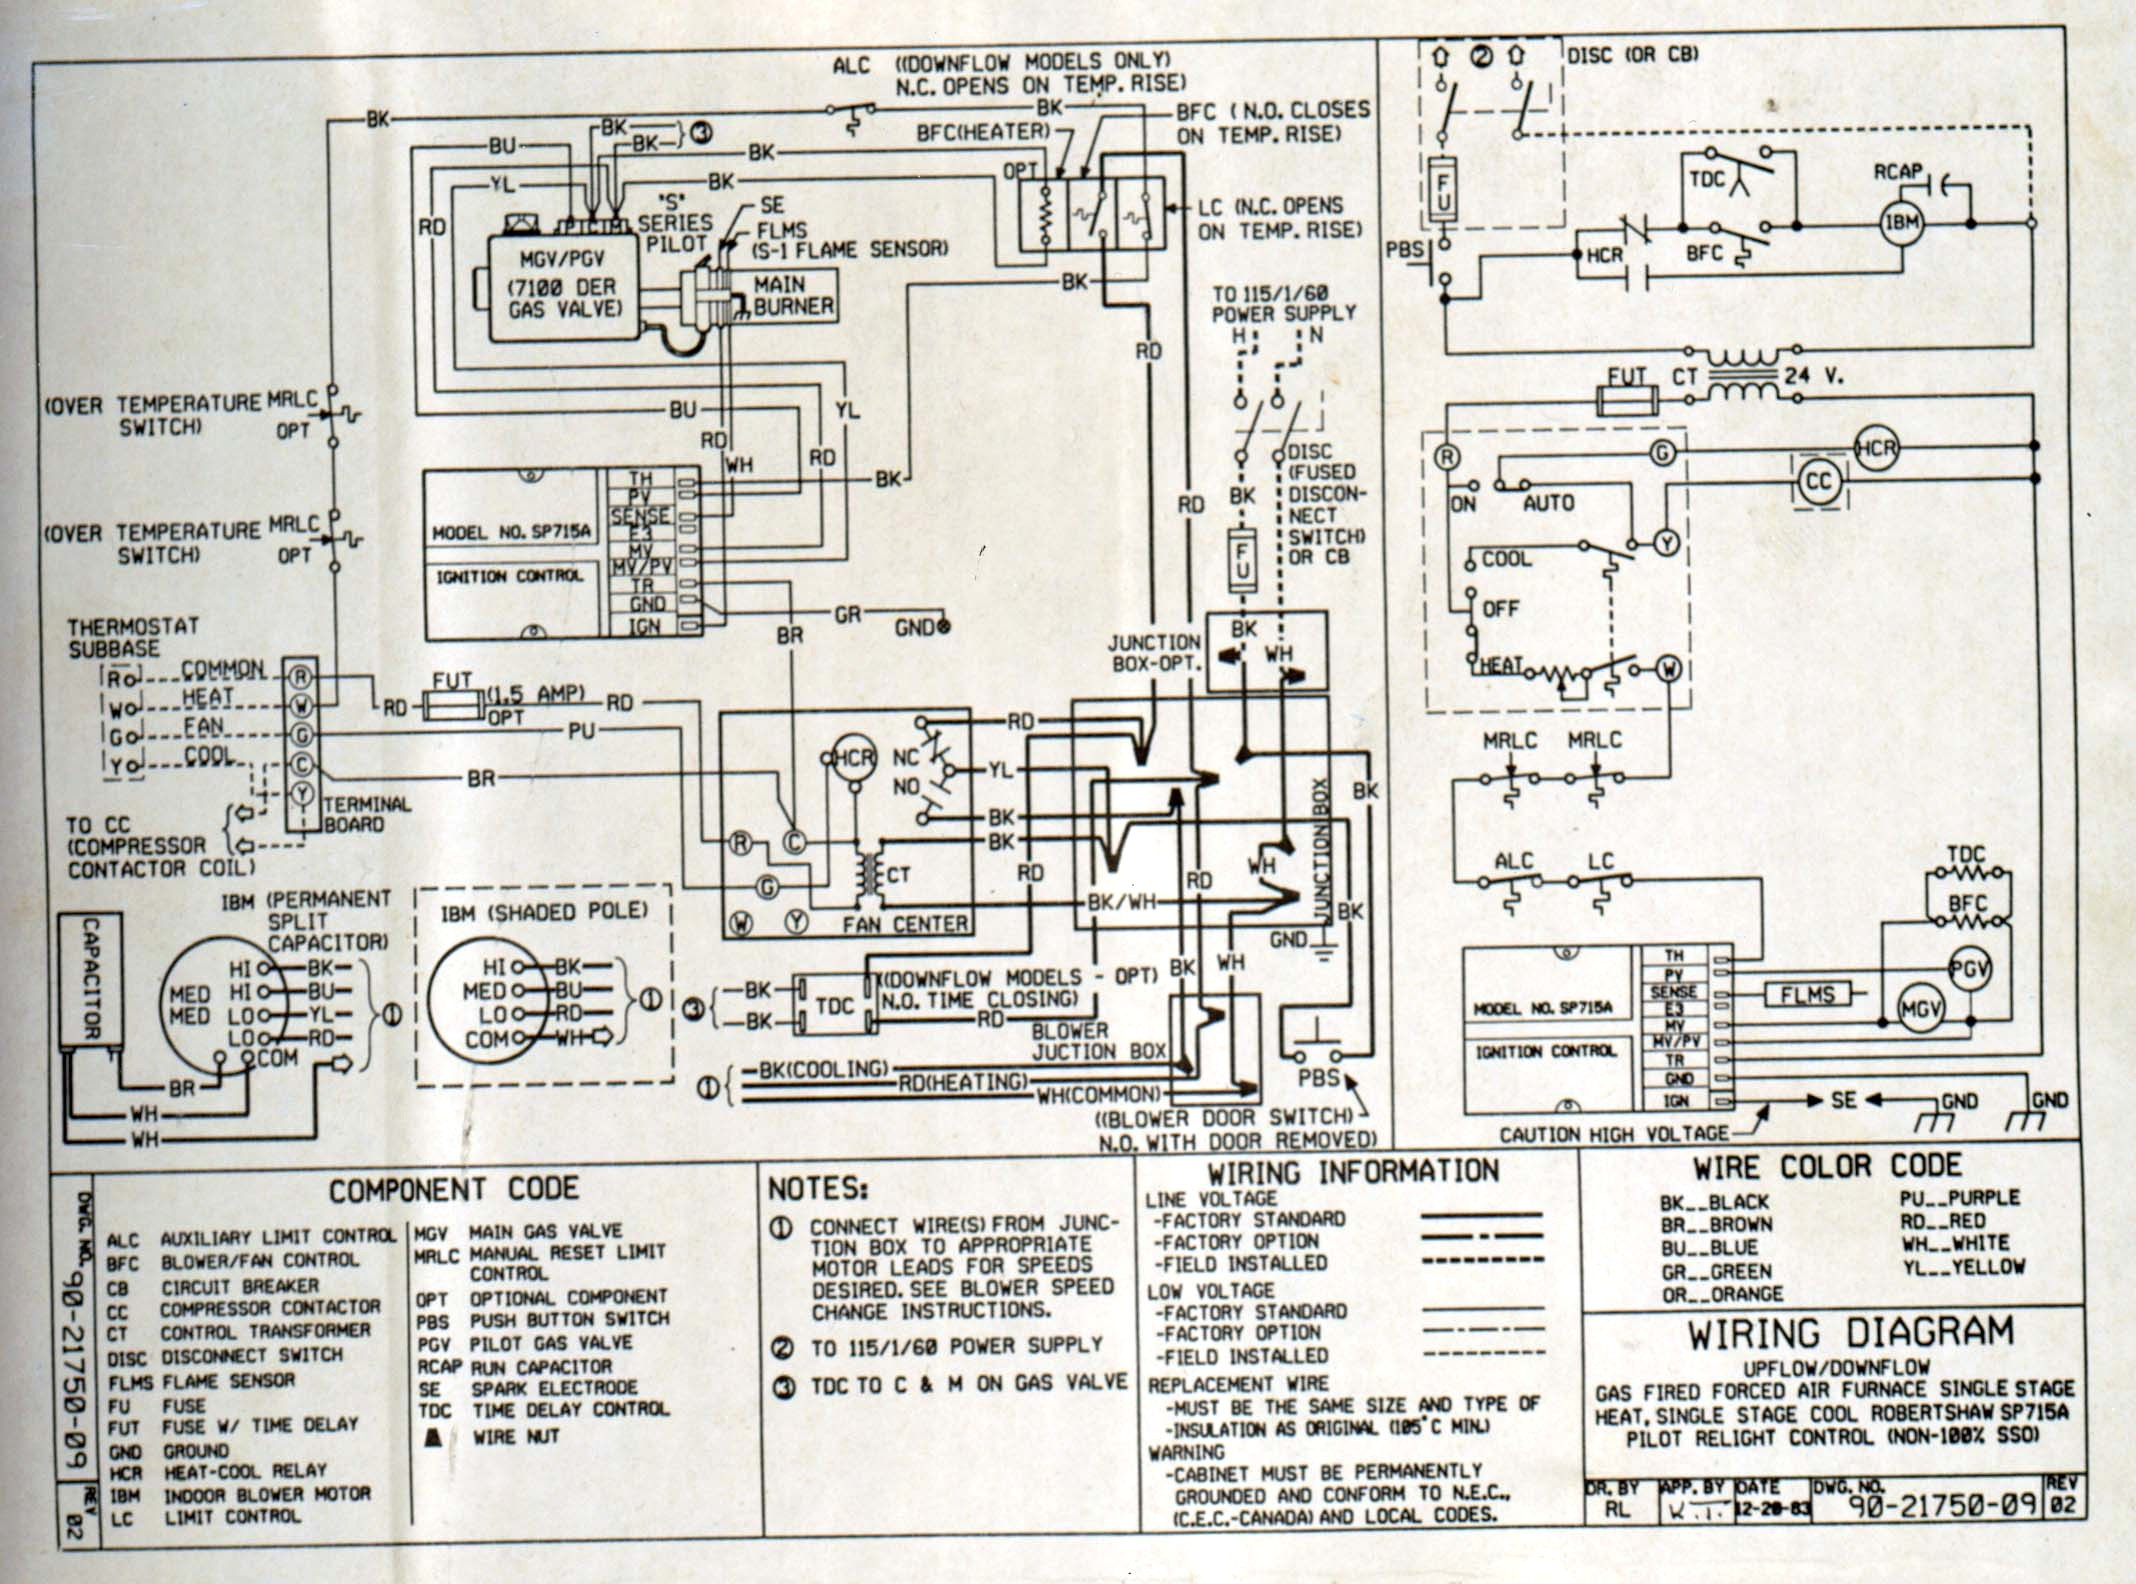 trane voyager wiring diagram inspirational wiring diagram image rh mainetreasurechest com Wiring-Diagram Trane Split System Trane Commercial Wiring Diagrams